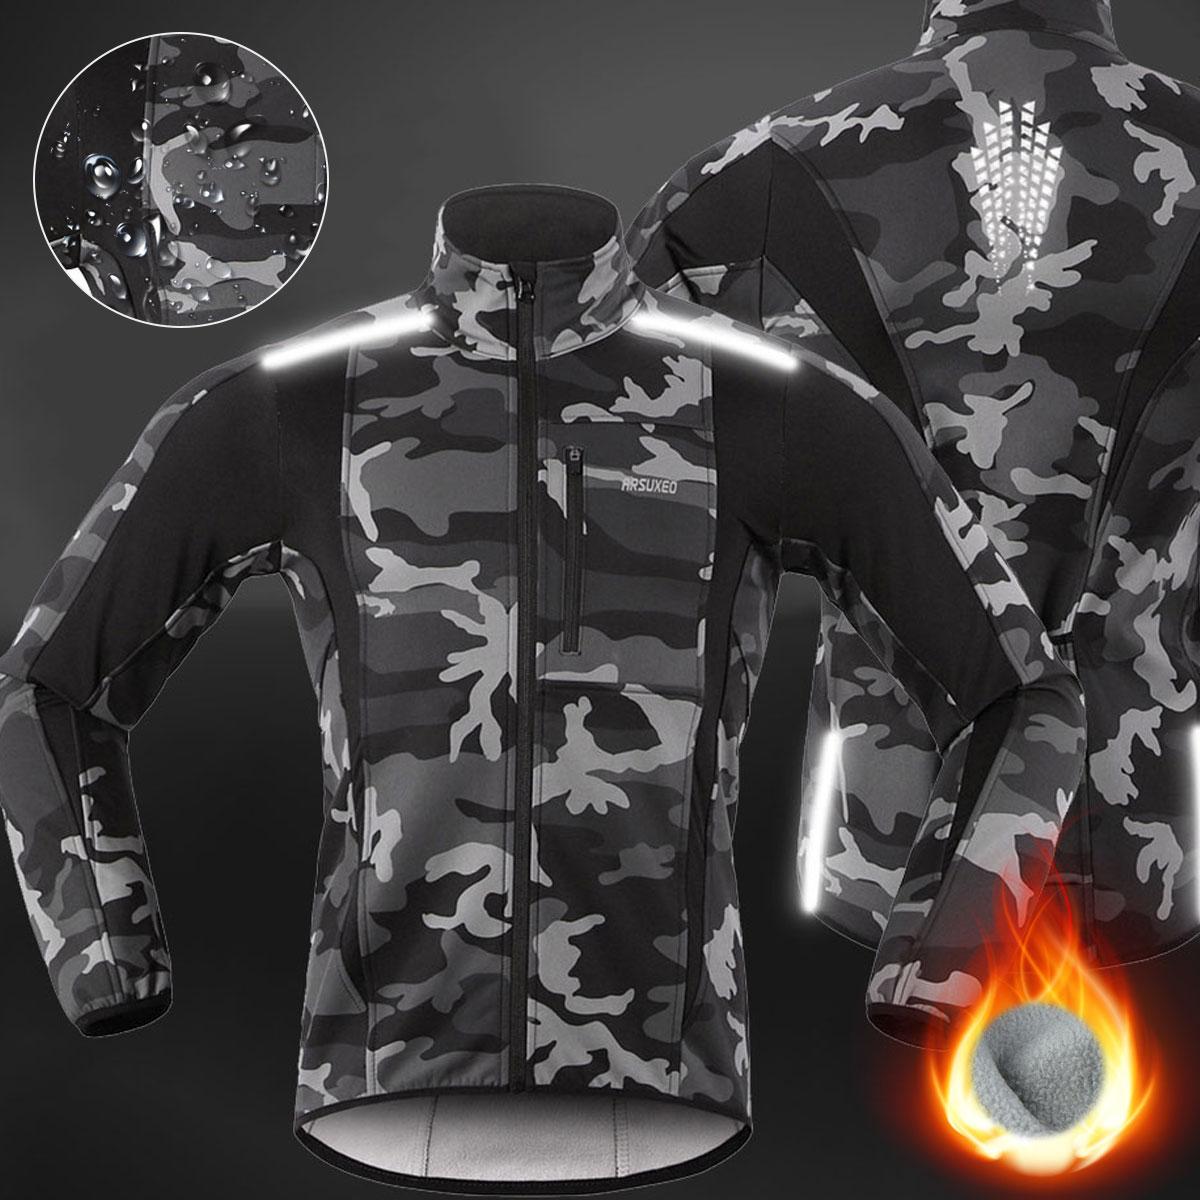 Chaqueta térmica de lana para ciclismo para hombre, ropa para bicicleta de montaña a prueba de viento, impermeable, Jersey largo, chaqueta de viento para correr